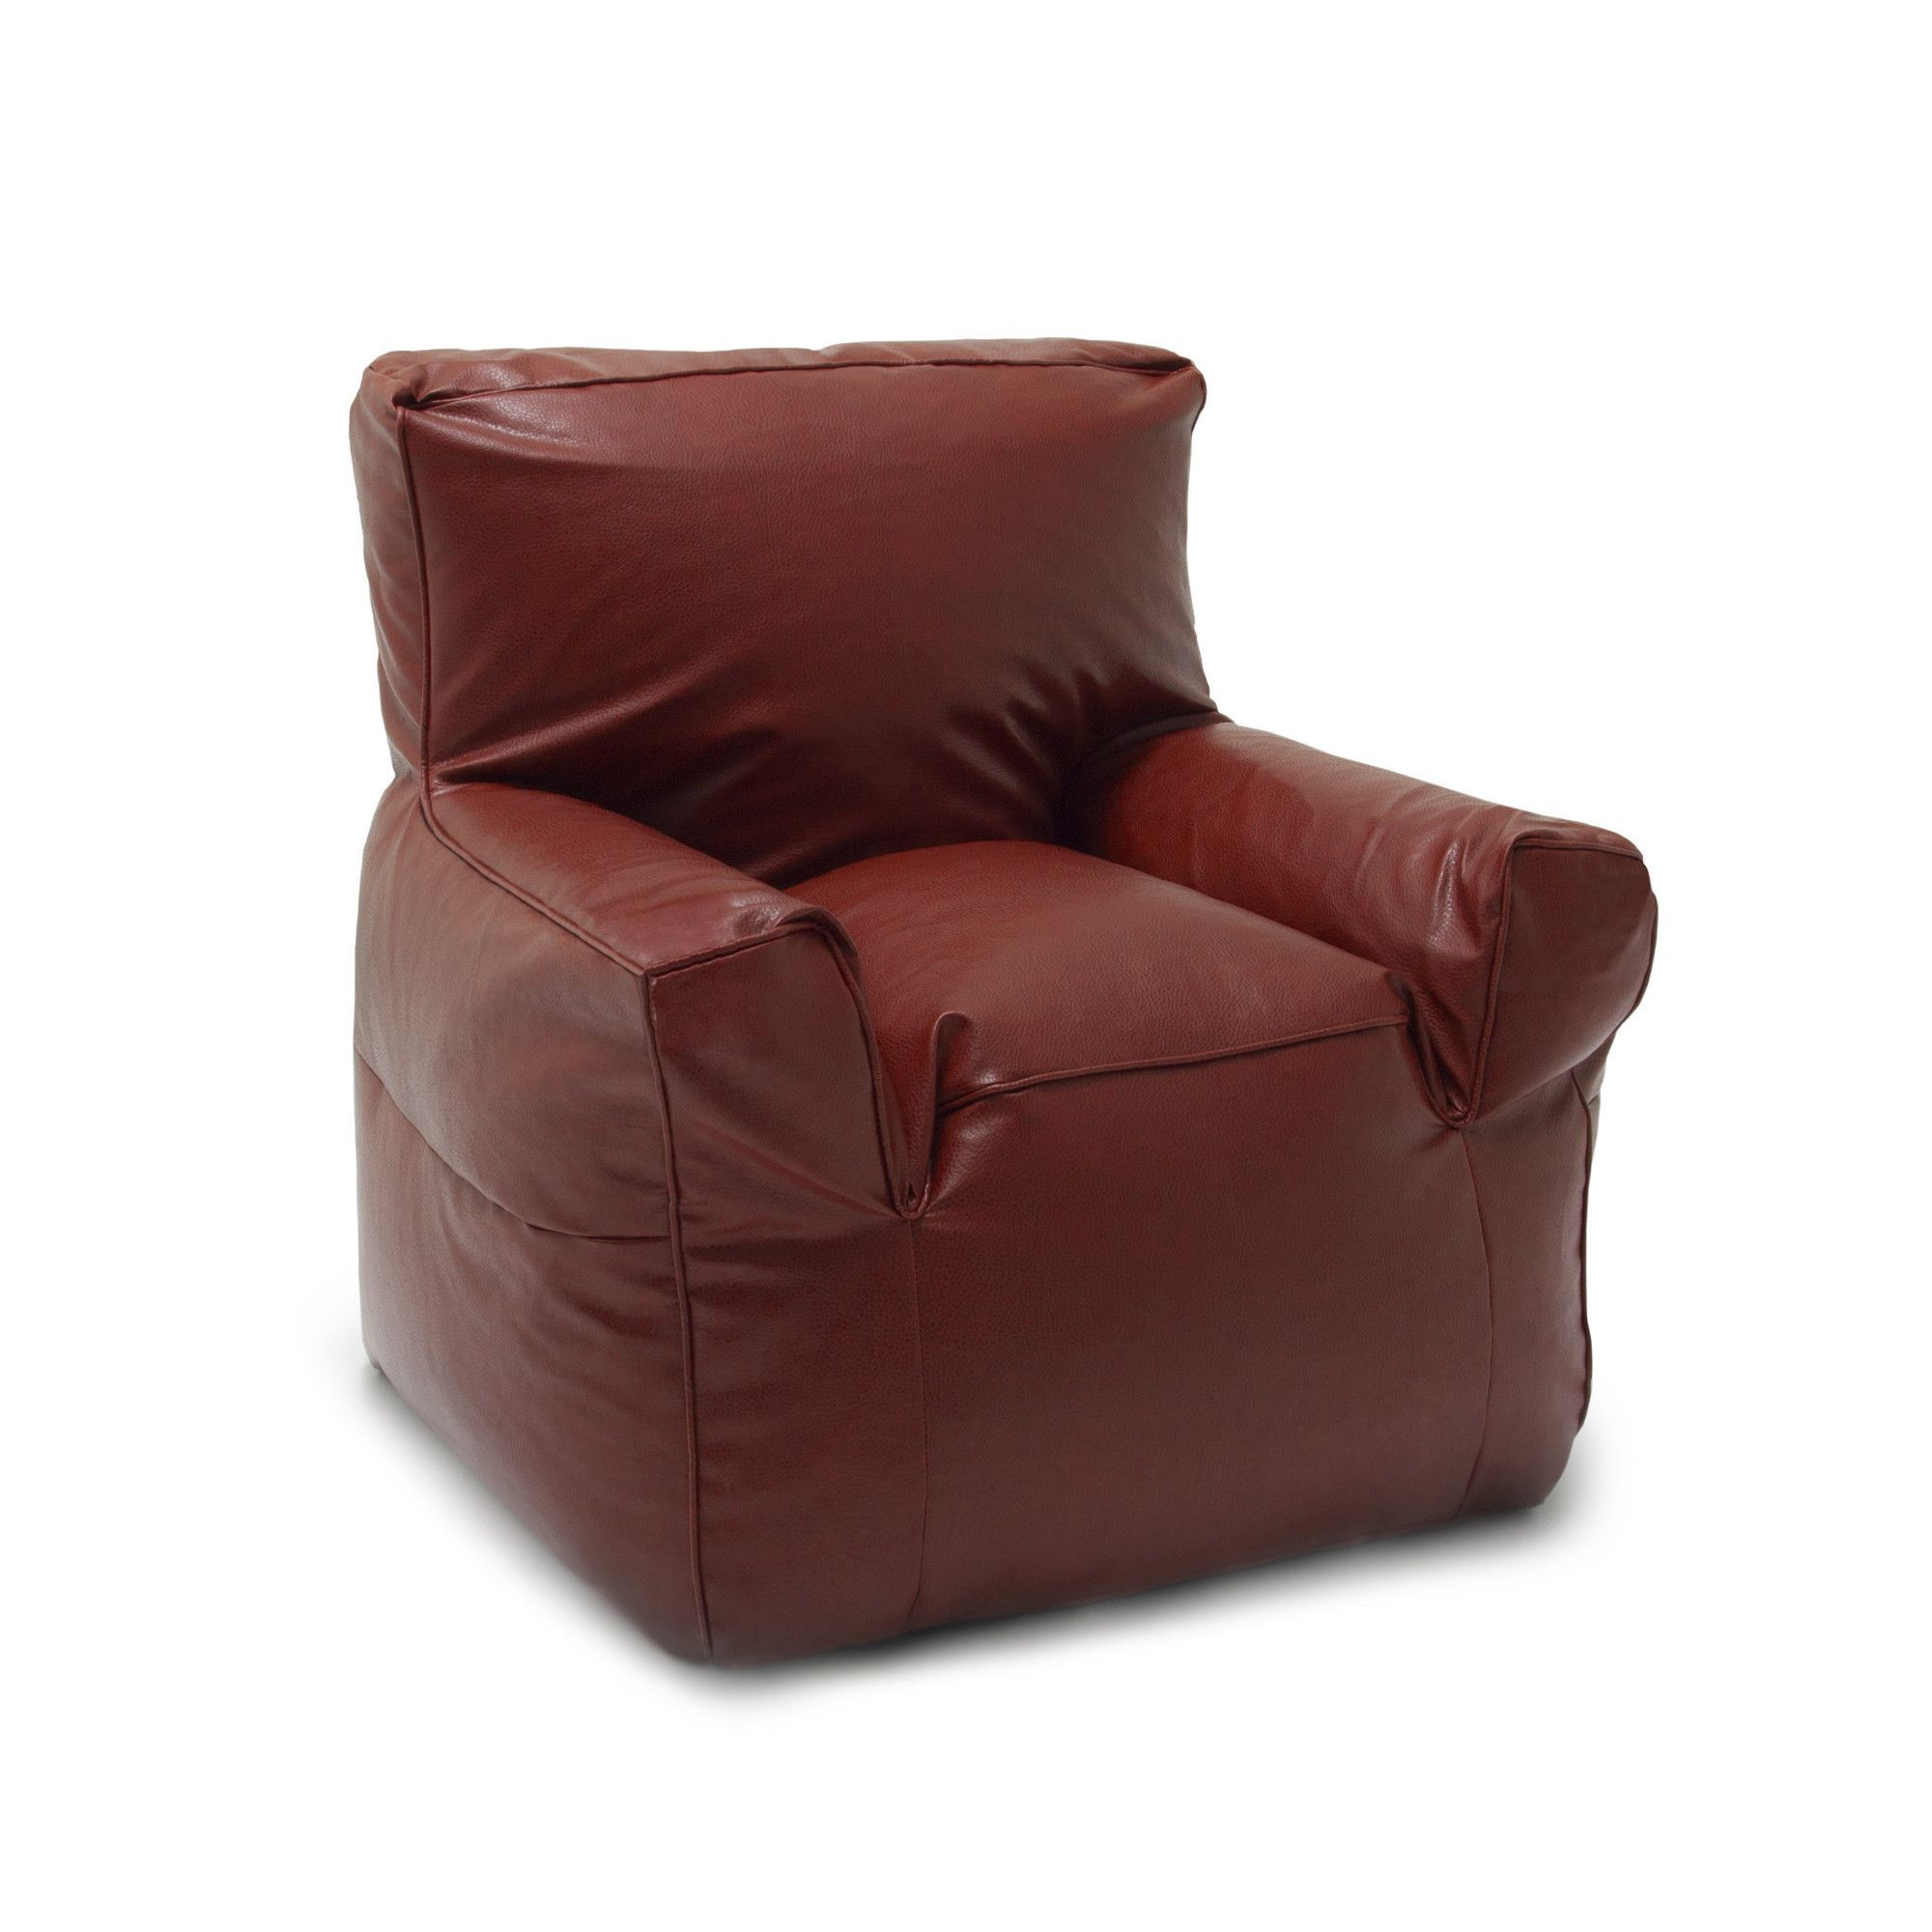 Big joe suite bean bag lounger bean bag lounger bean